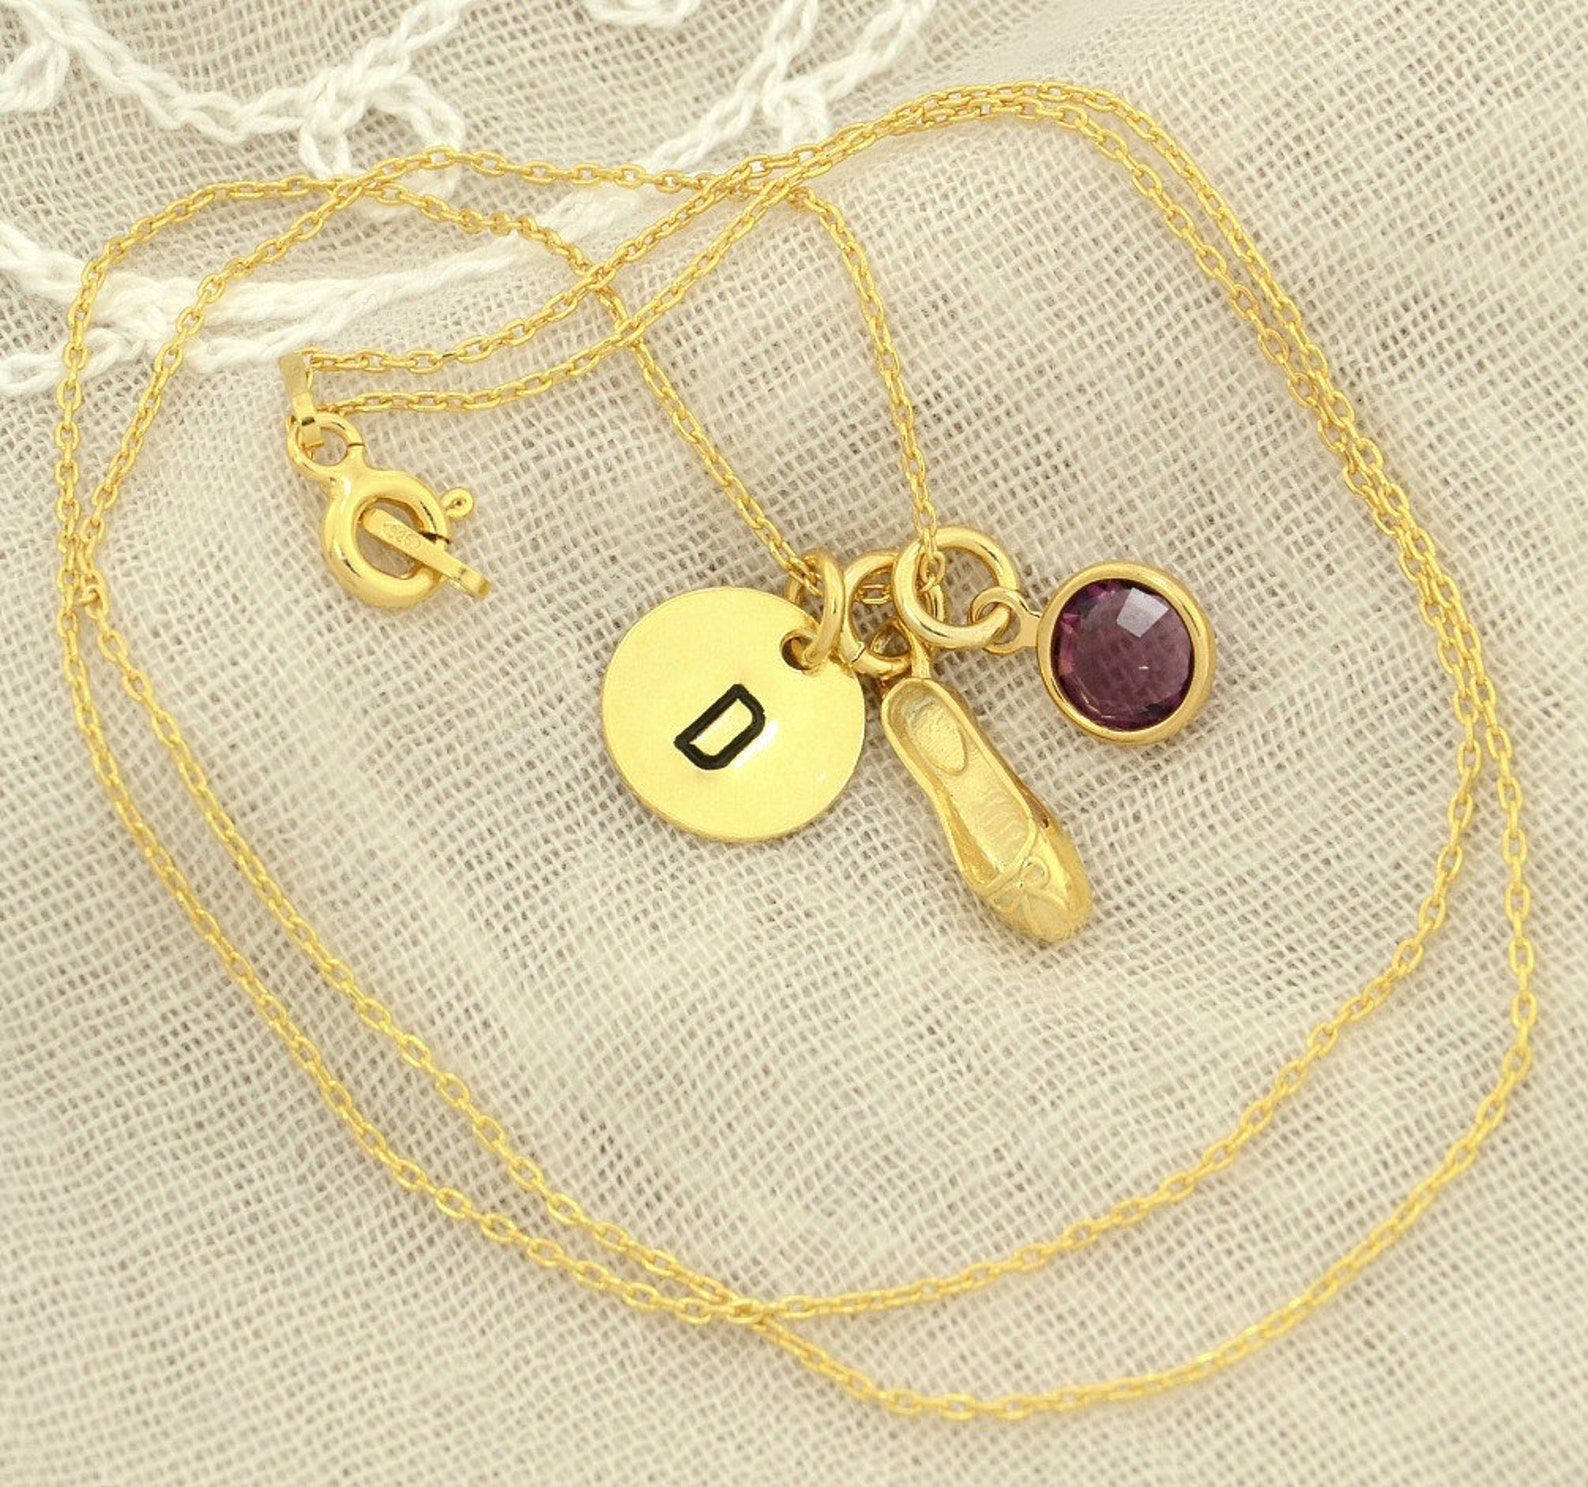 ballet slipper shoe gold sterling silver personalized pendant w swarovski birthstone crystal initial custom letter disc necklace